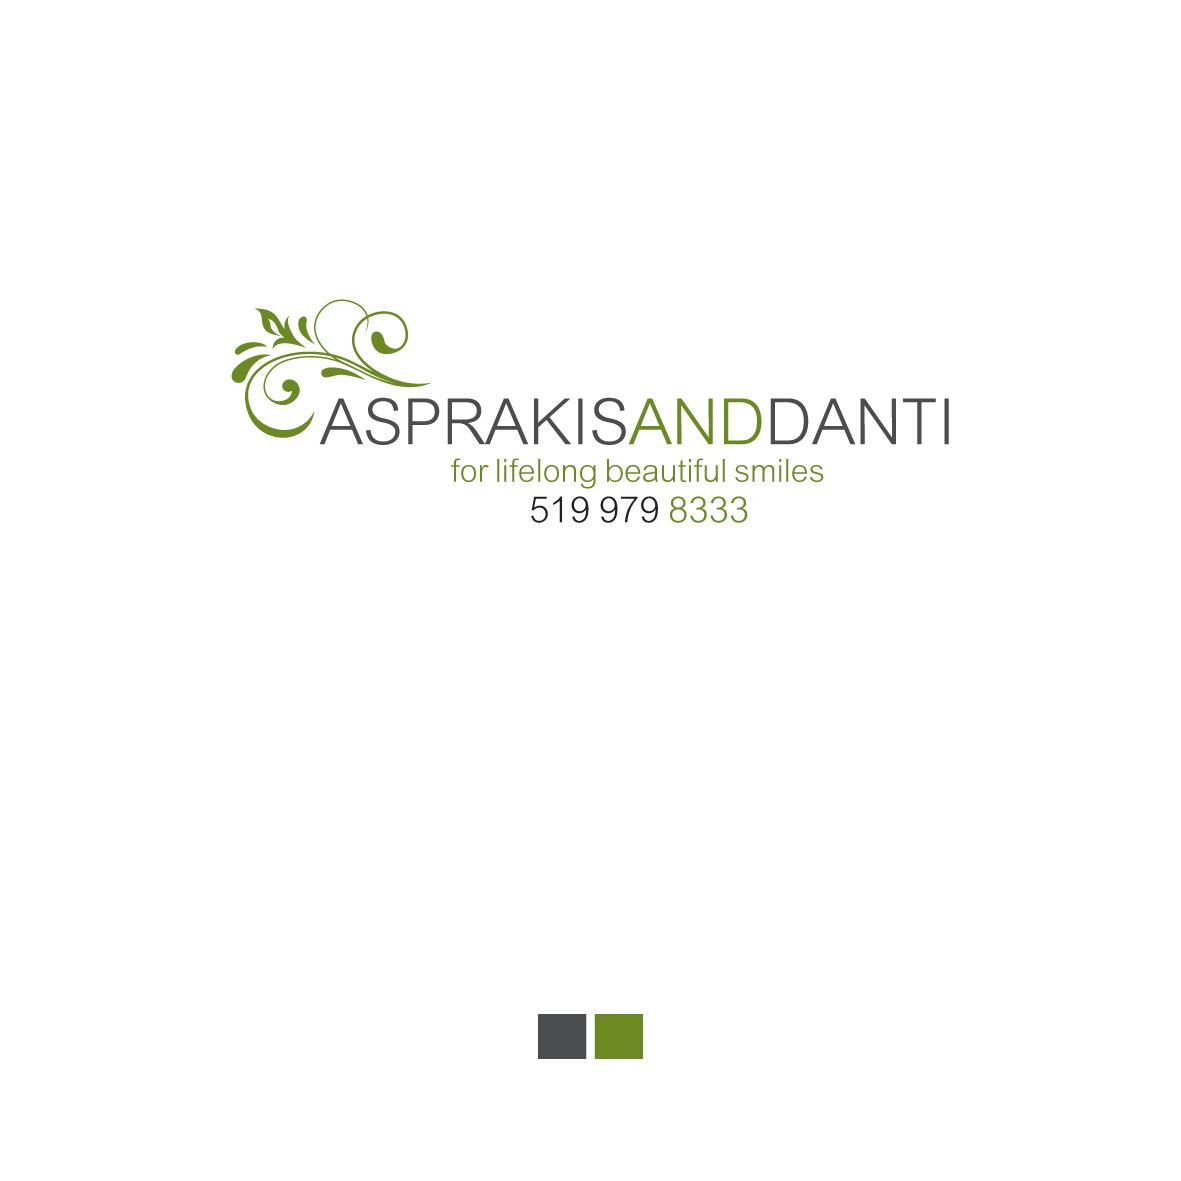 Logo Design by Alexandros Konstantinou - Entry No. 197 in the Logo Design Contest Unique Logo Design Wanted for Asprakis and Danti.